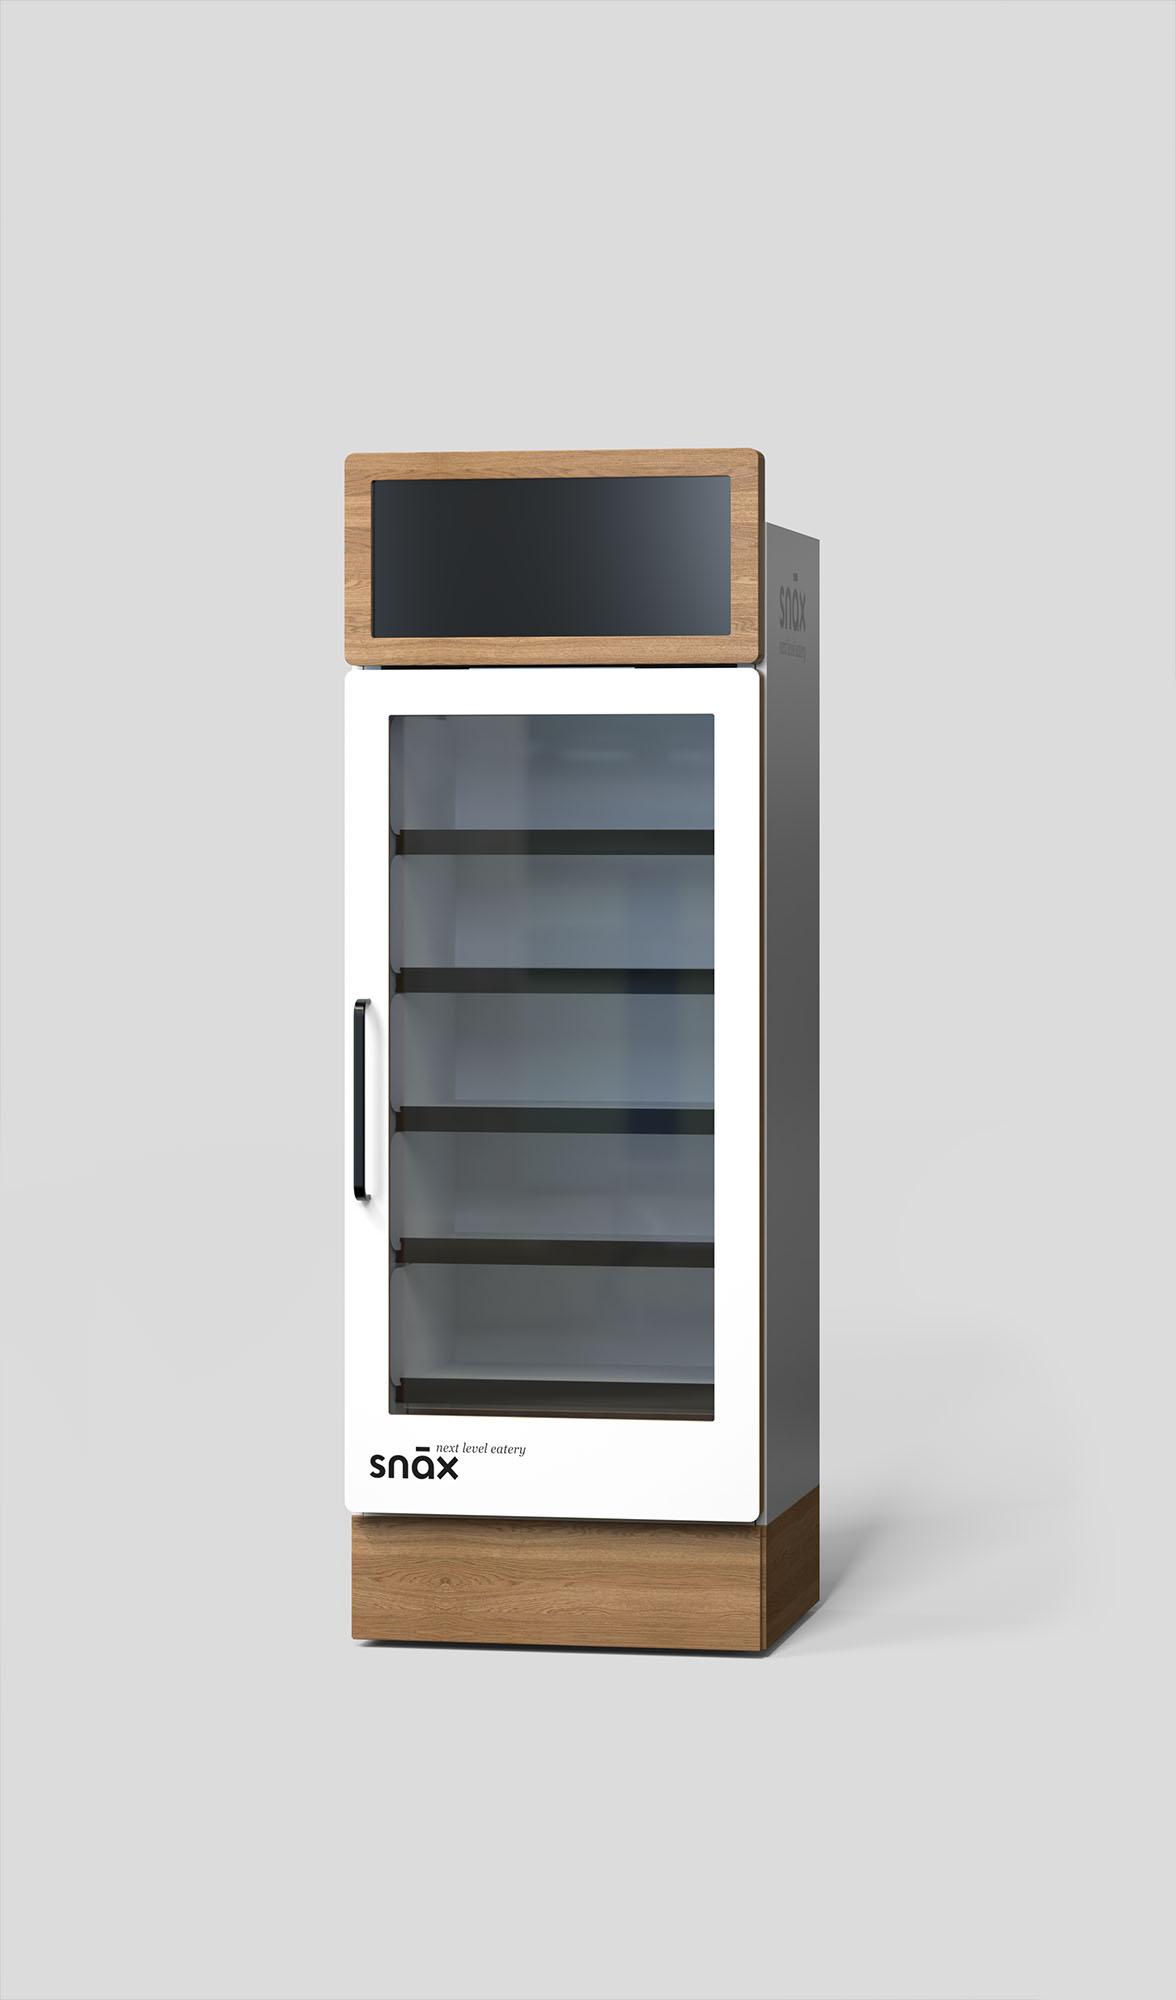 Andreas Bhend Industrial Design Studio Snaex – small